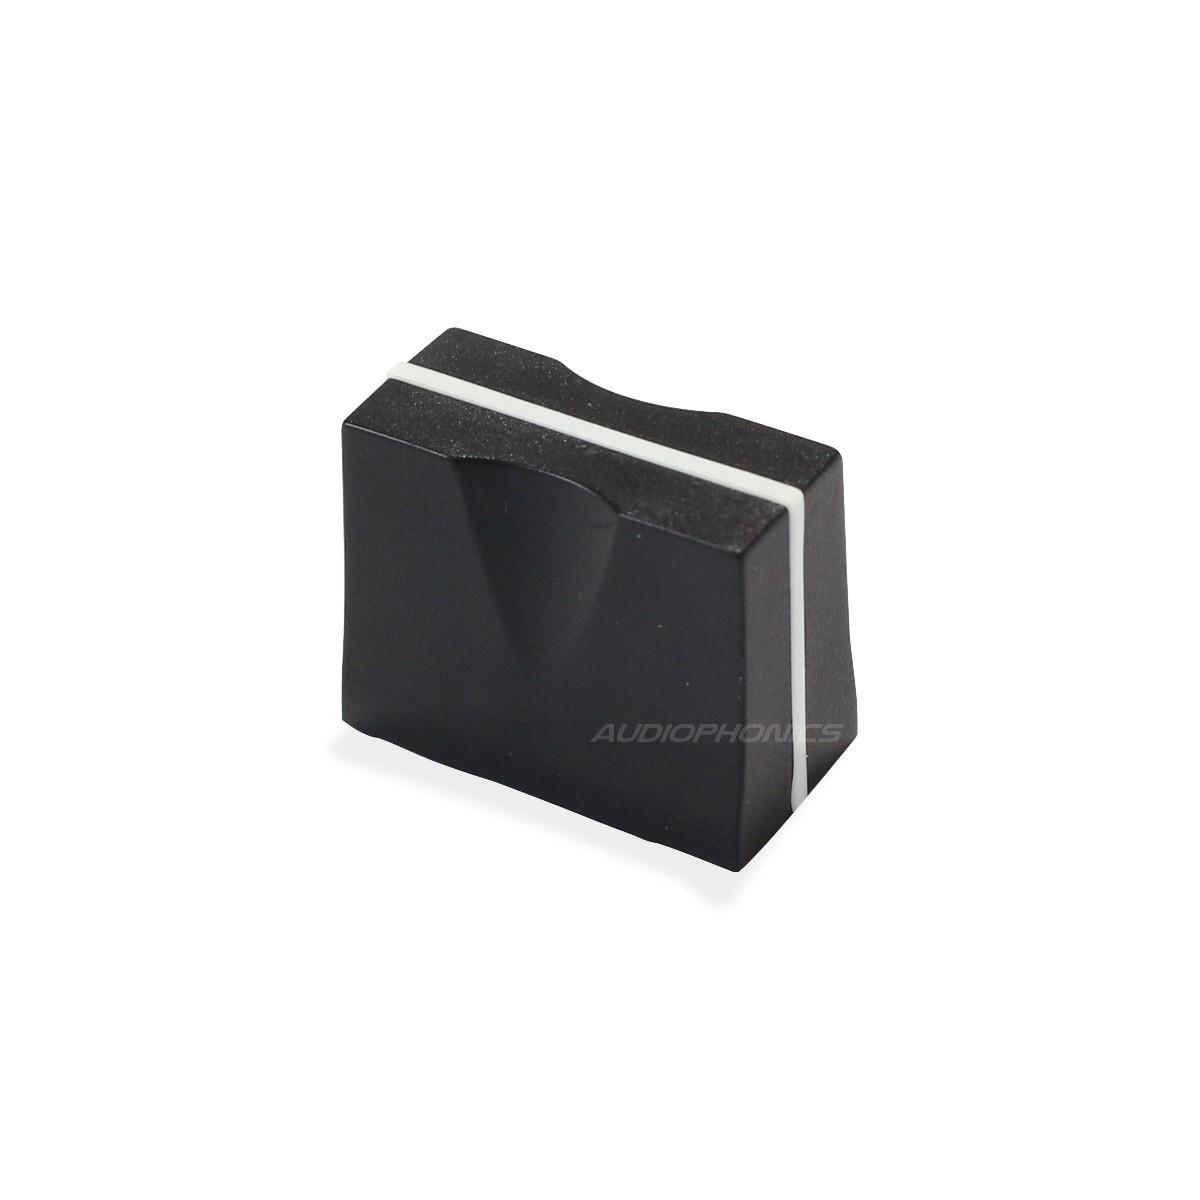 Black Fader Knob 19x10x15mm for Slide Potentiometer 7mm